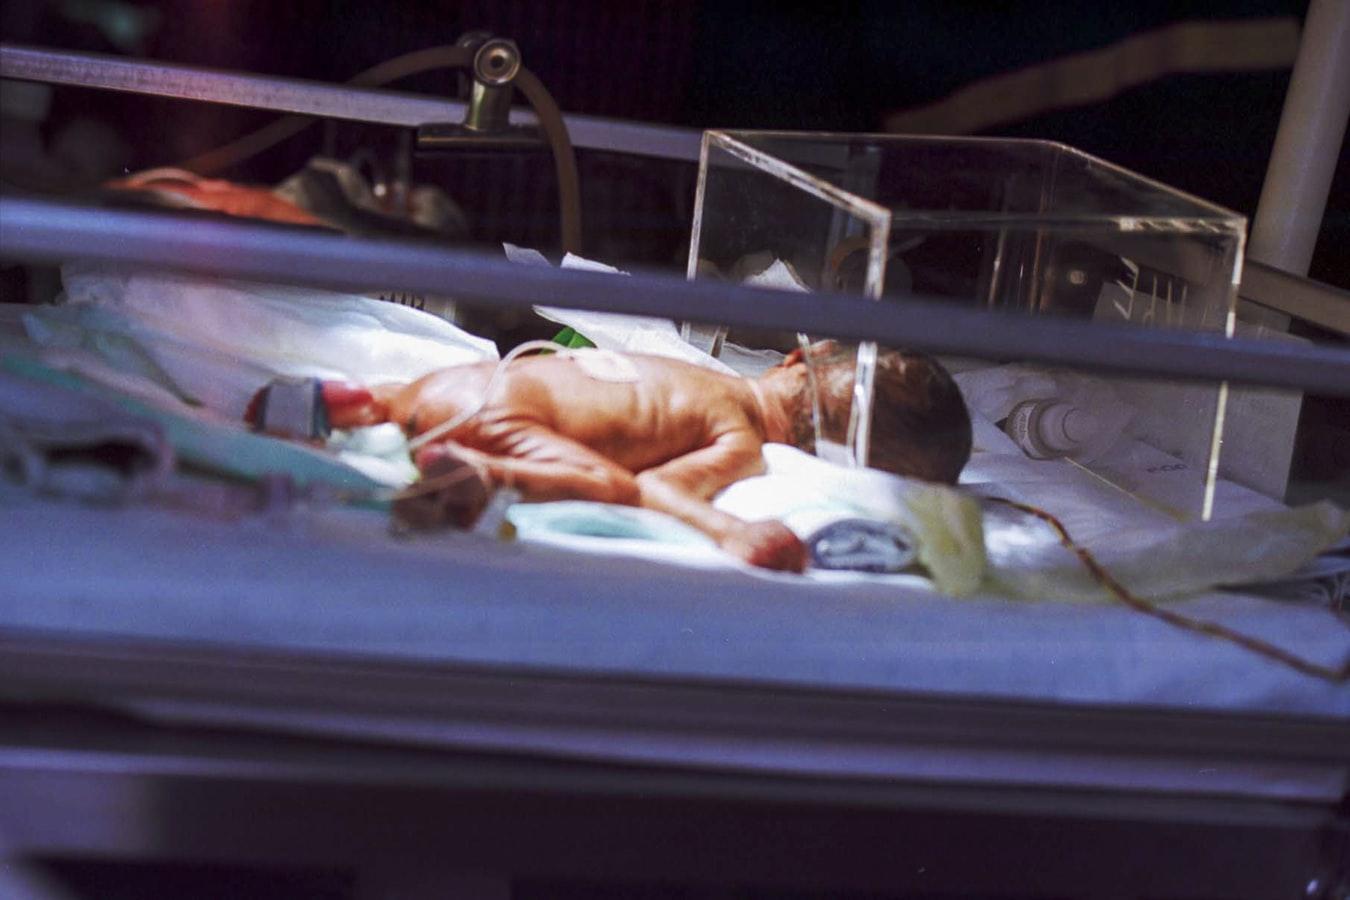 Bayi Tabung: Bagaimana Prosedur dan Berapa Biaya yang Diperlukan?